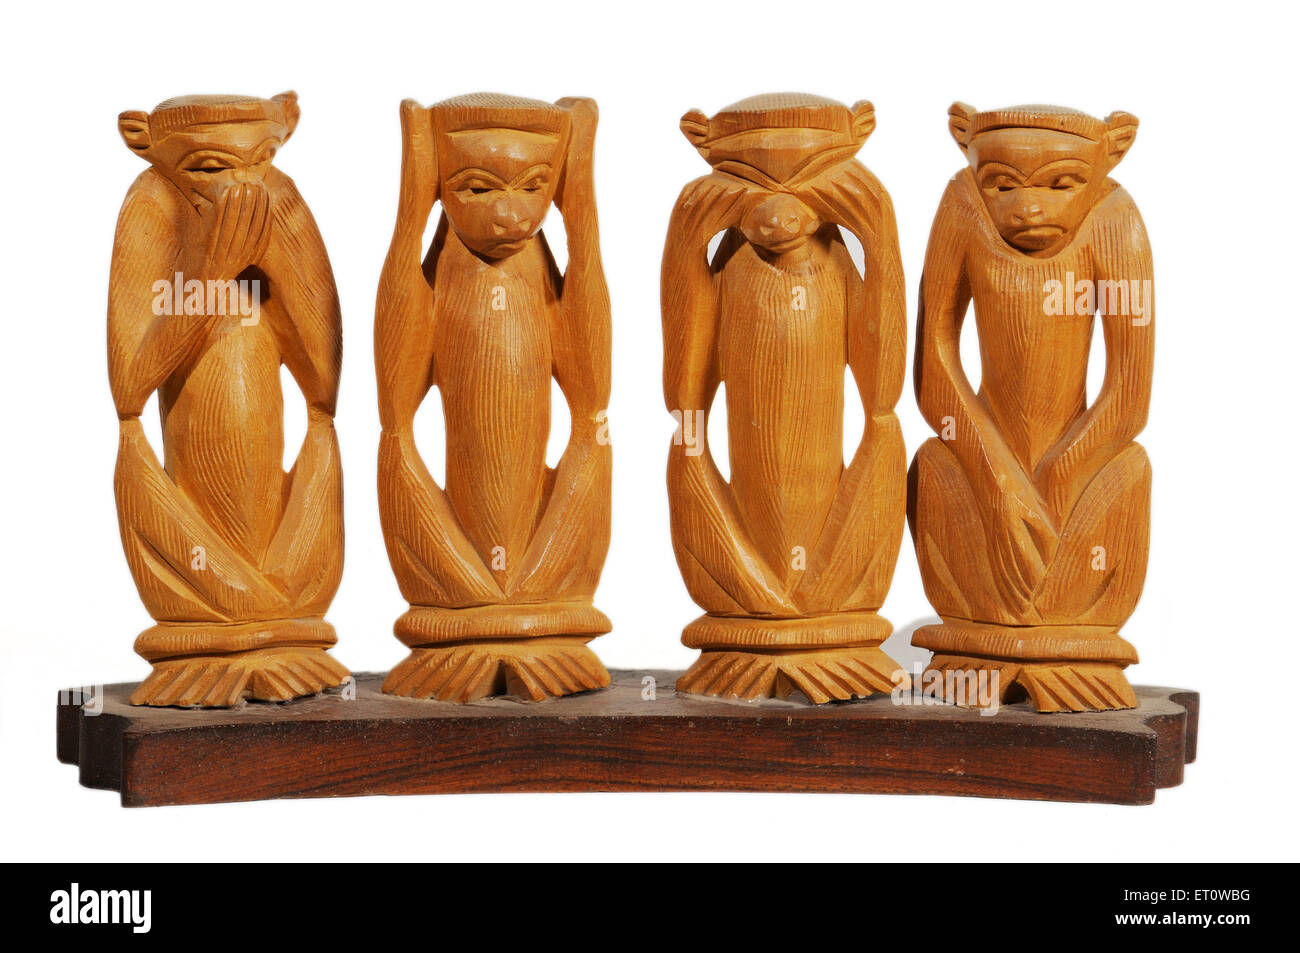 Handicraft wooden monkeys ; India - Stock Image